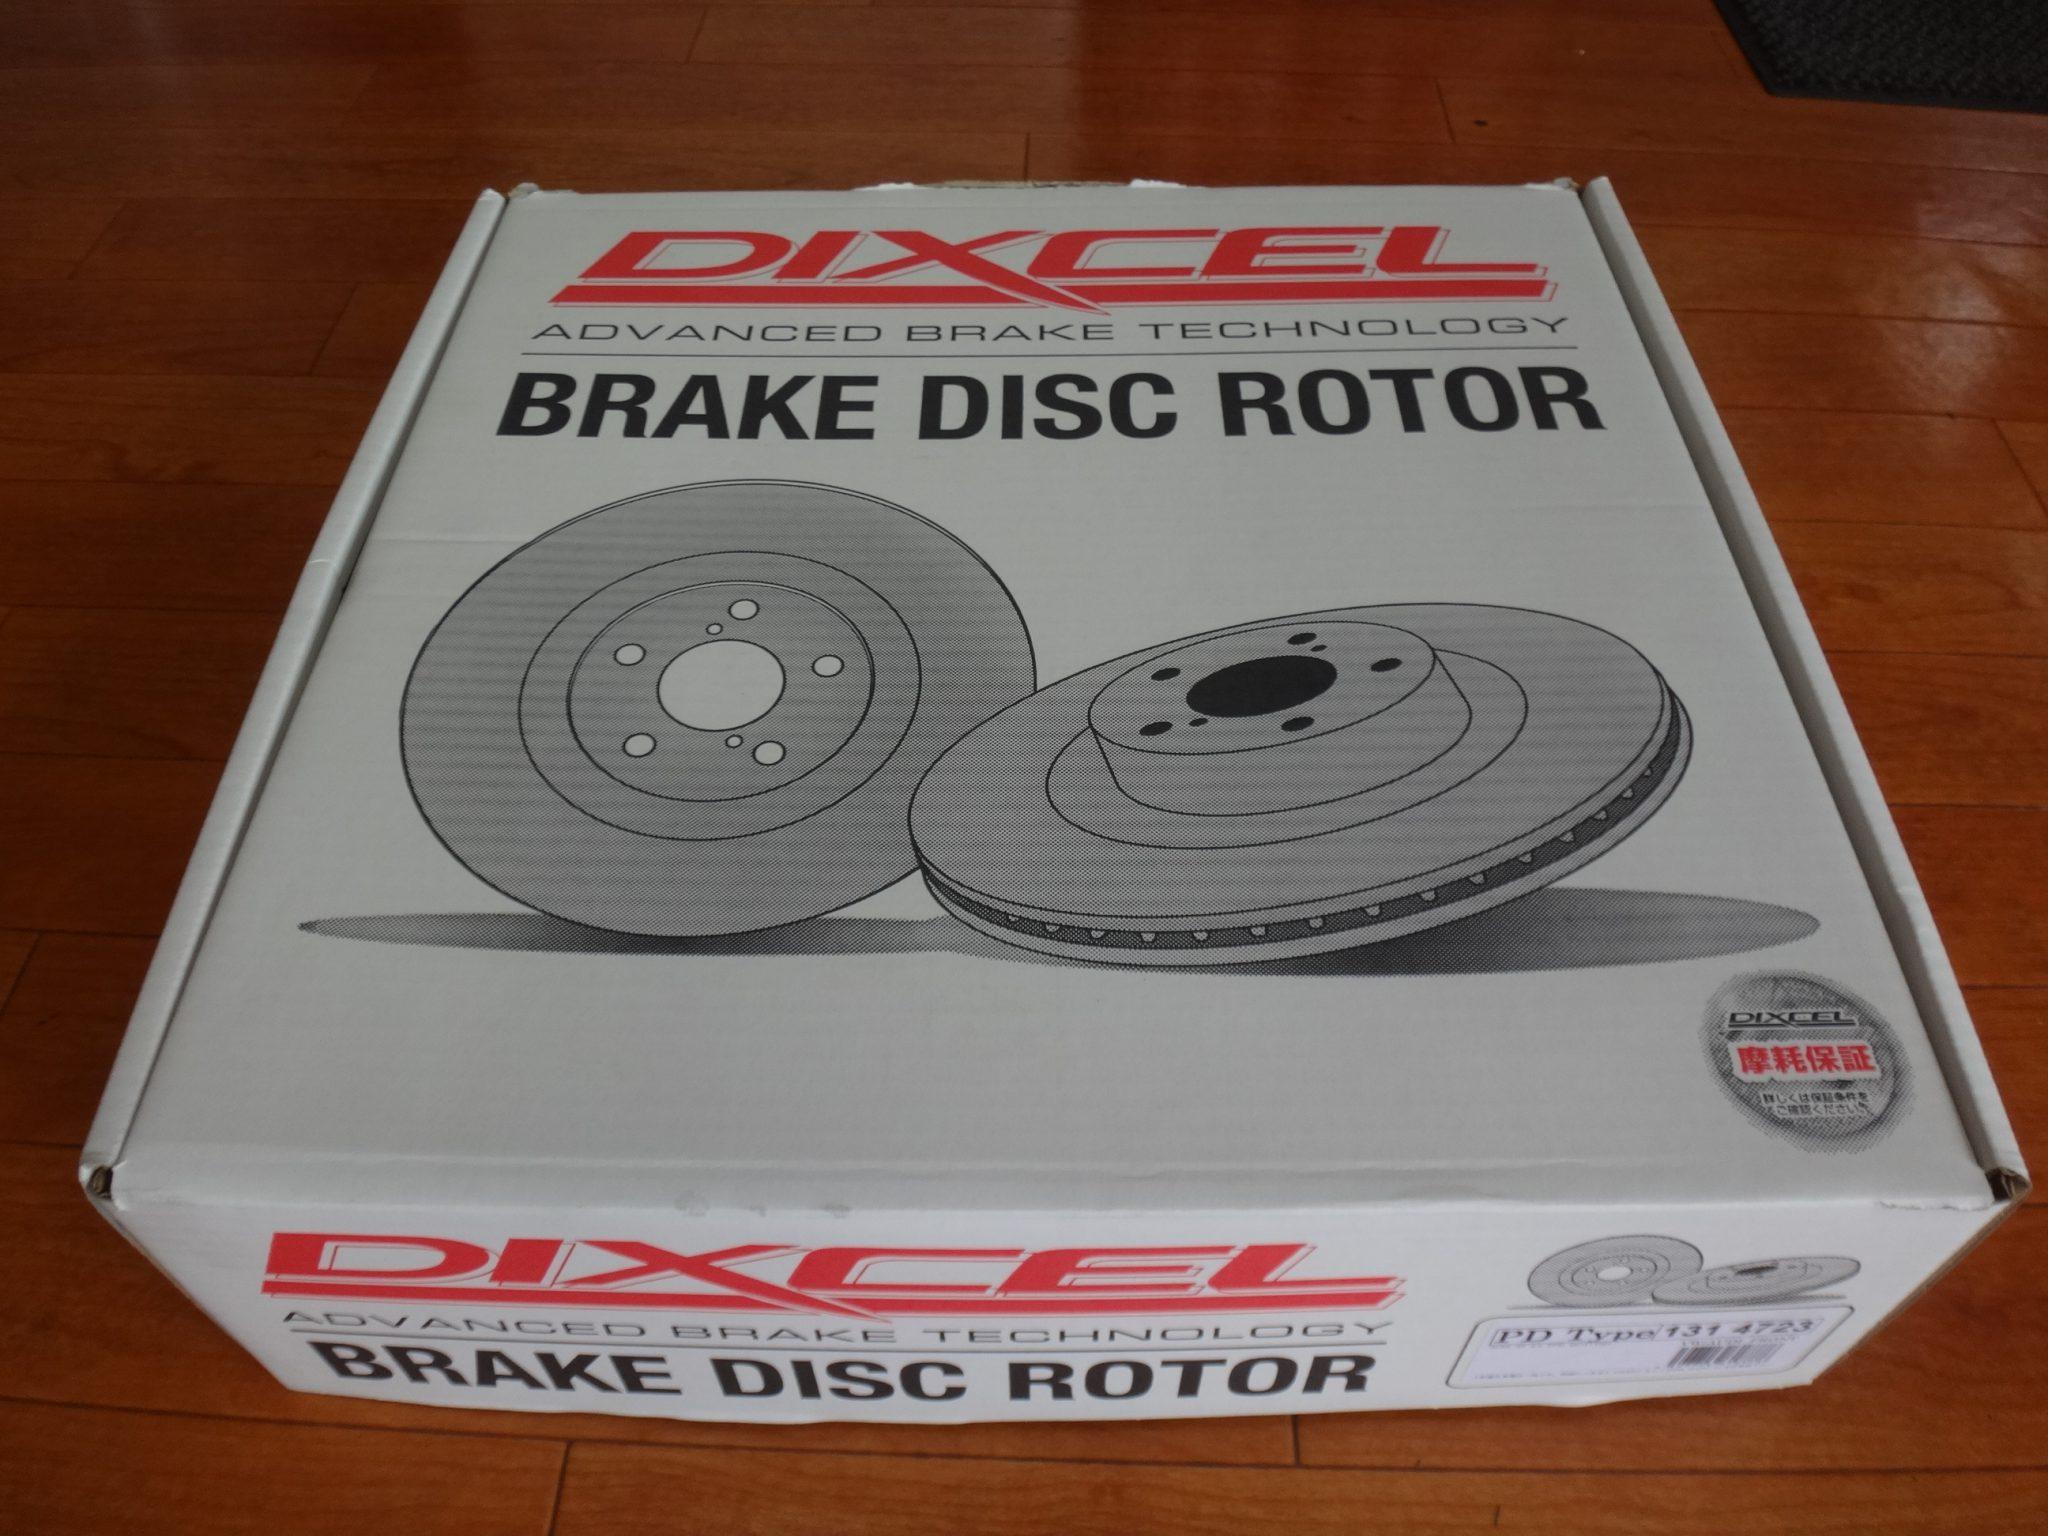 Audi,A7,sportback,3.0T,FSI,quattro,4WD,ディクセル,ブレーキディスクローター,ブレーキパッド,ブレーキセンサー,